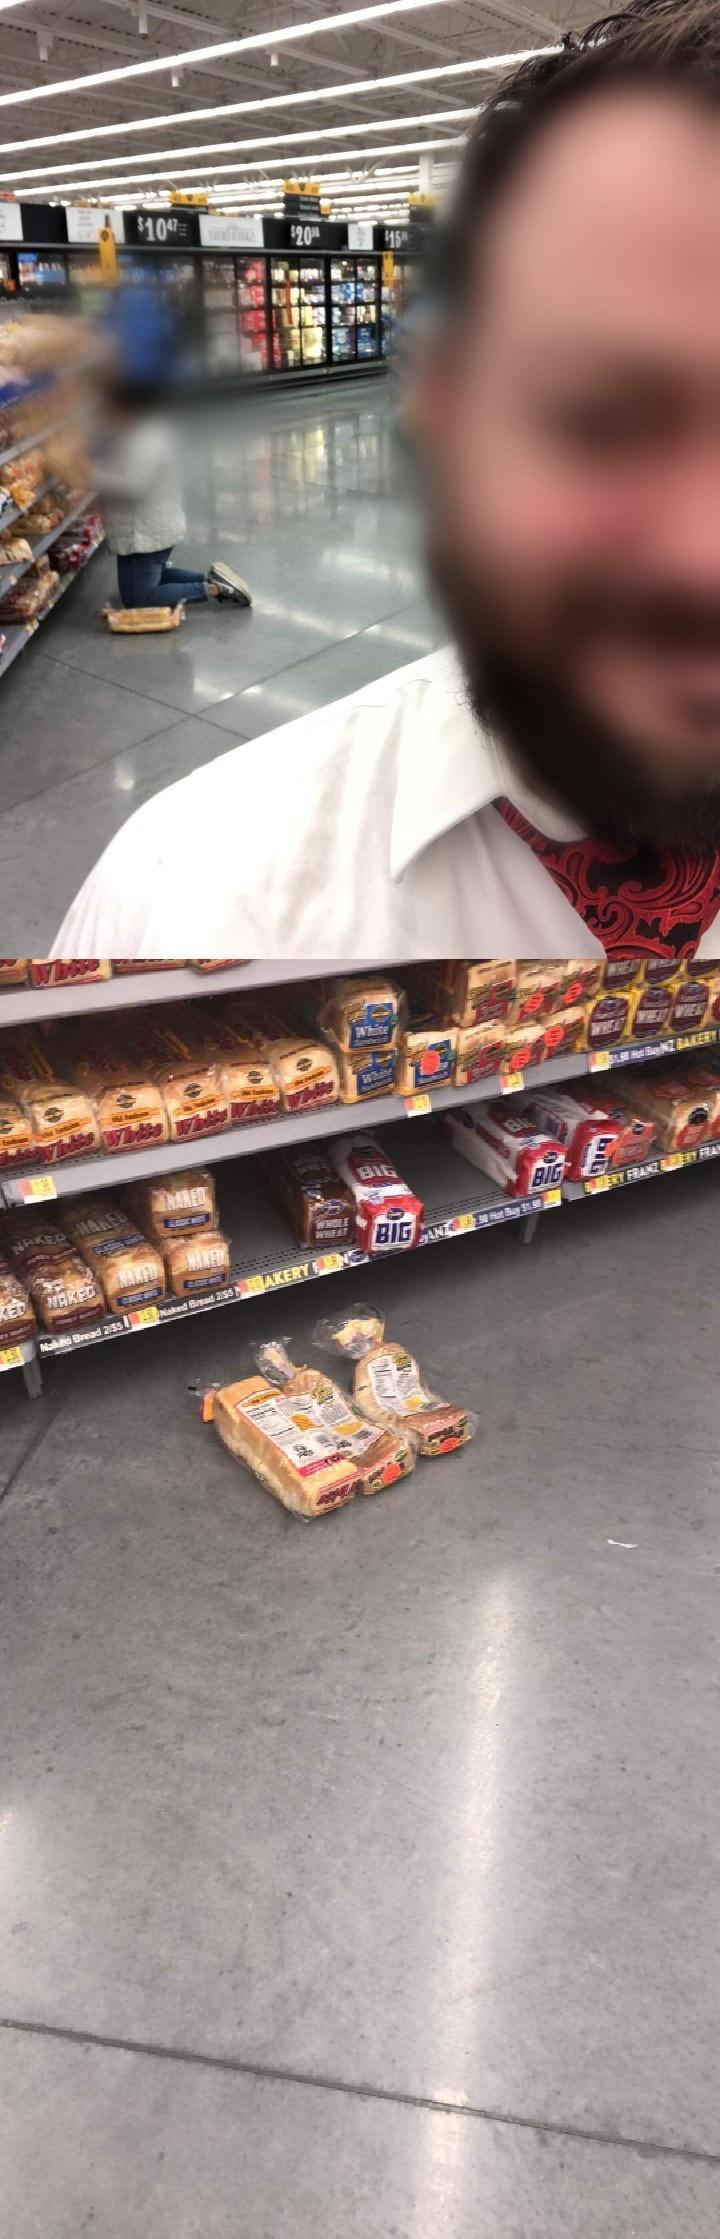 Supermarket - $10 $20 whise ARAKFD NAKED NAEL NARED KERYF ed Bosad 255 NakBread 235